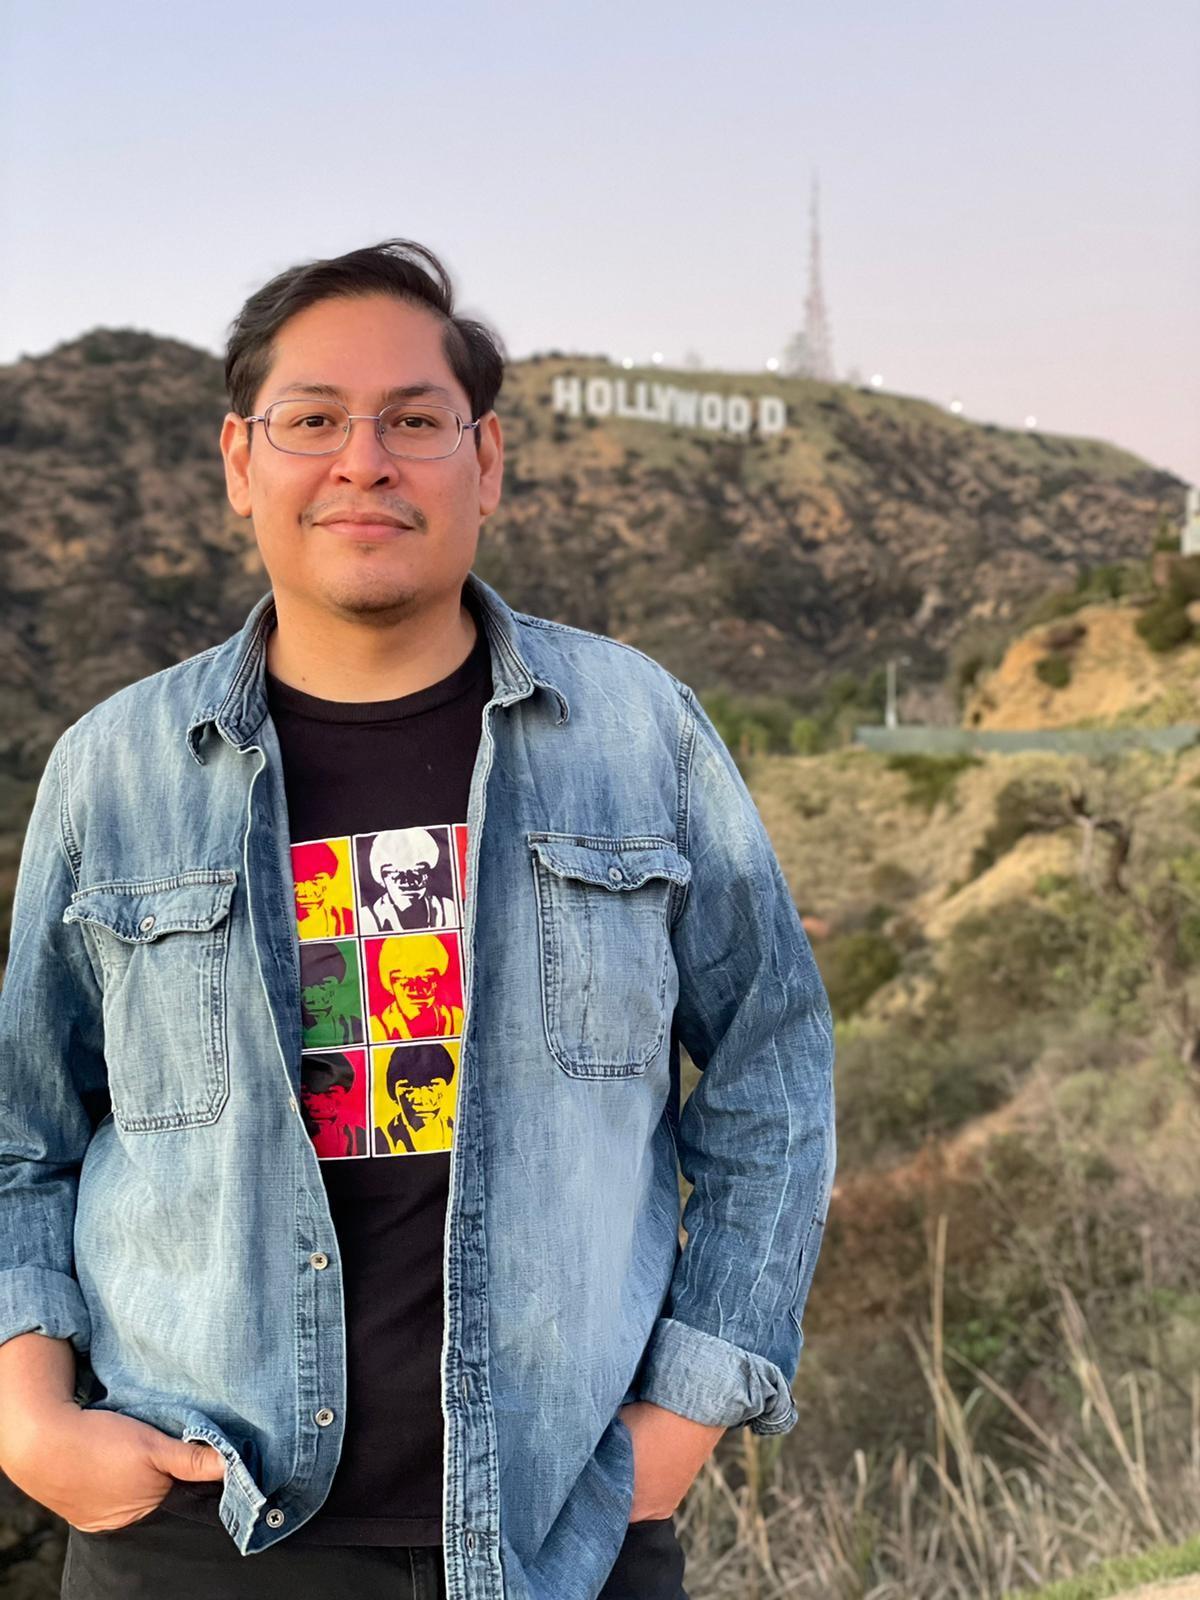 'Derrubando muros', indígena de MS lança curta-metragem em Hollywood